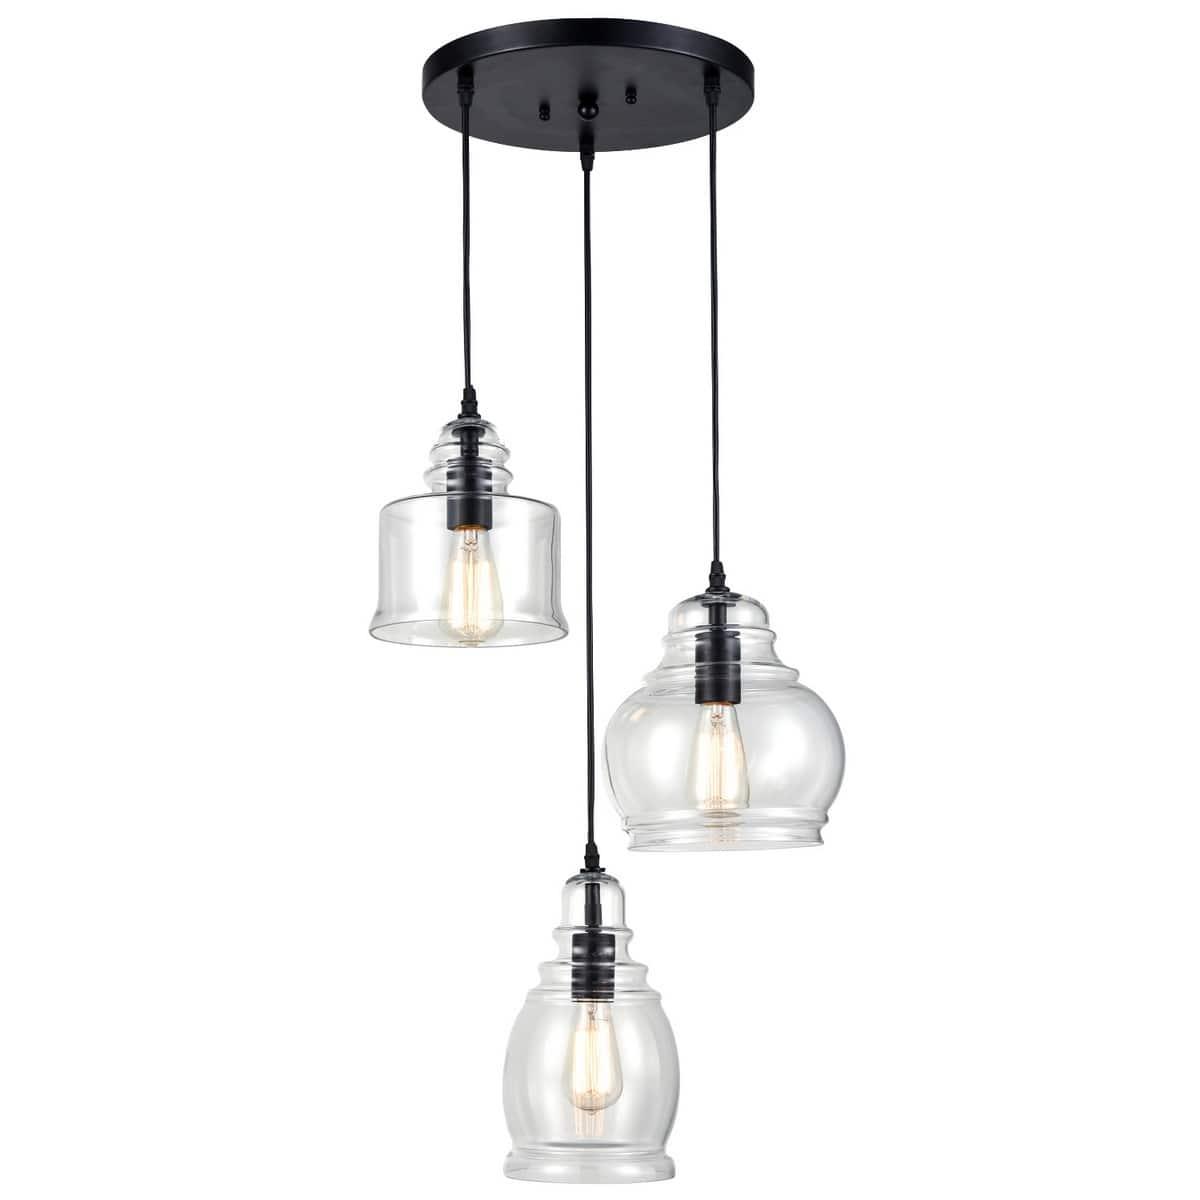 Modern Industrial Chandelier Mason Jar Island 3-Light Fixture